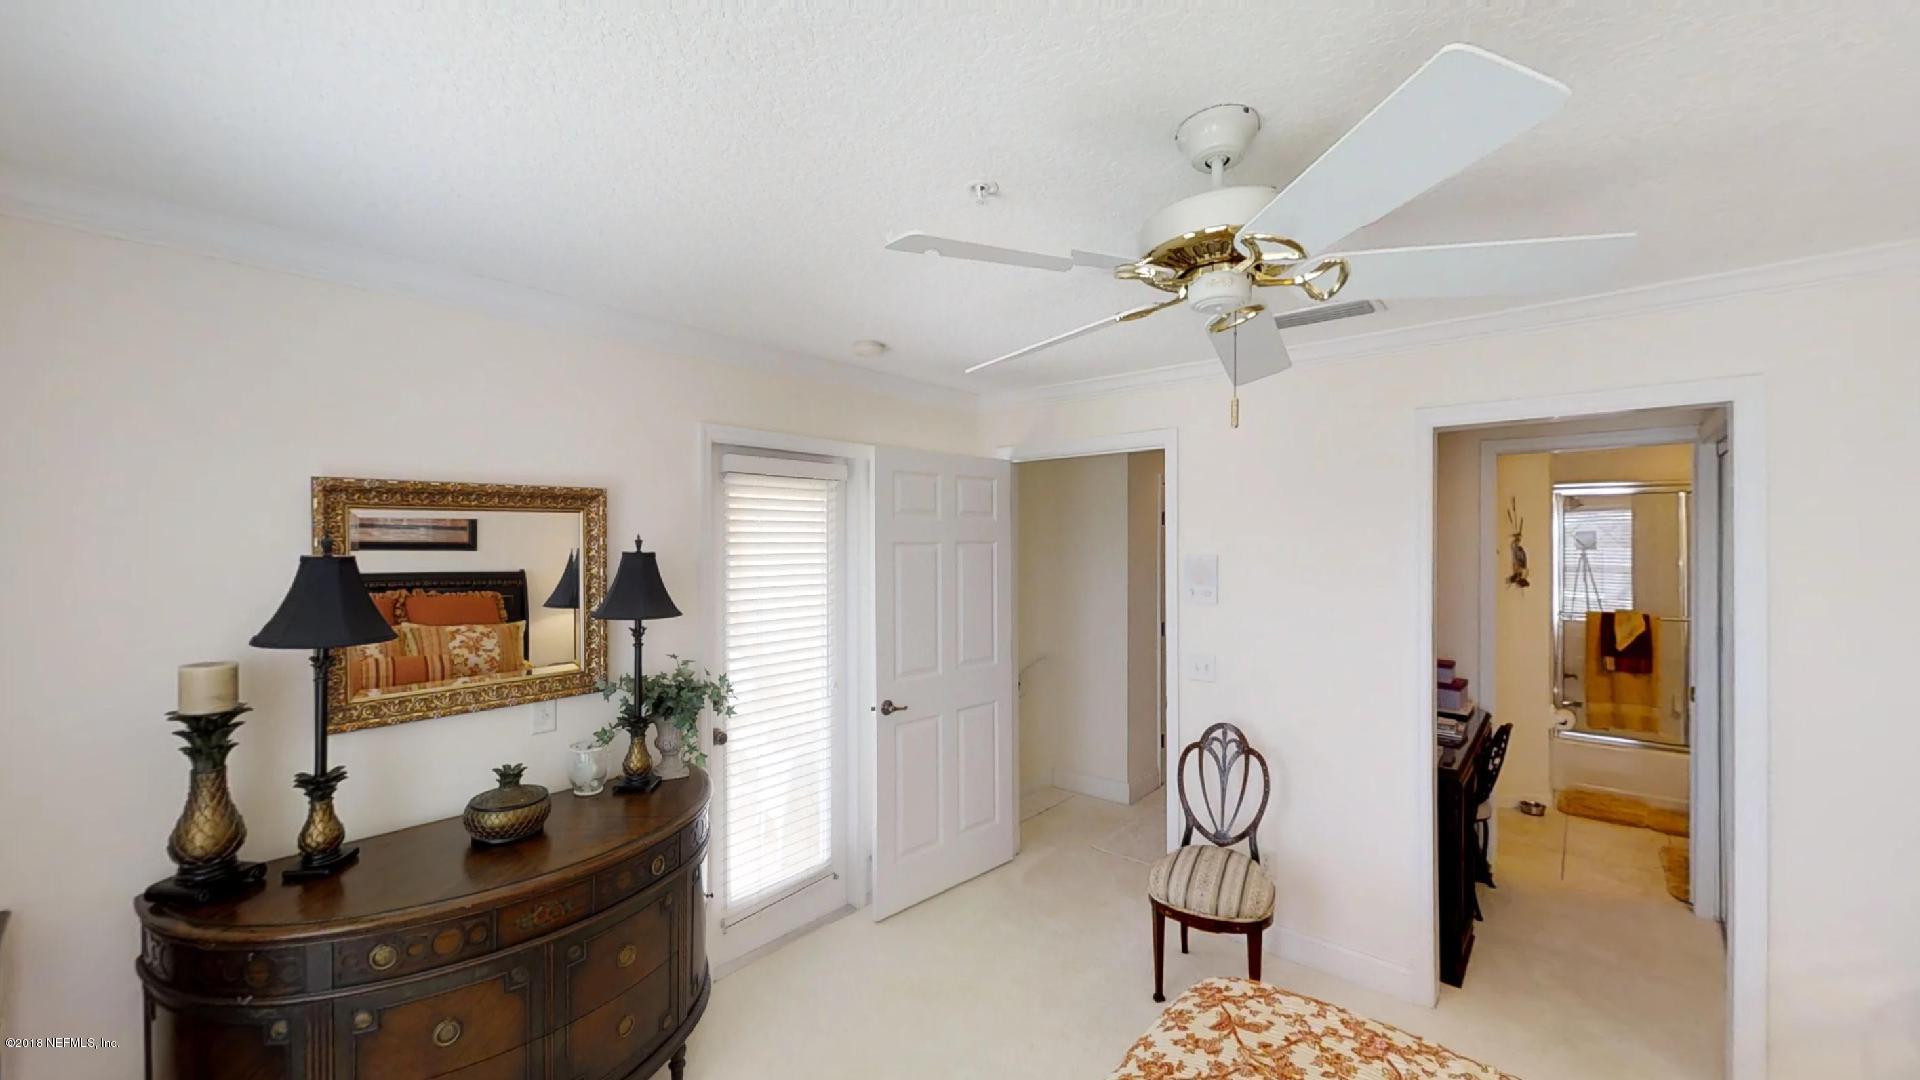 1603 WINDJAMMER, ST AUGUSTINE, FLORIDA 32084, 4 Bedrooms Bedrooms, ,4 BathroomsBathrooms,Residential - single family,For sale,WINDJAMMER,952482